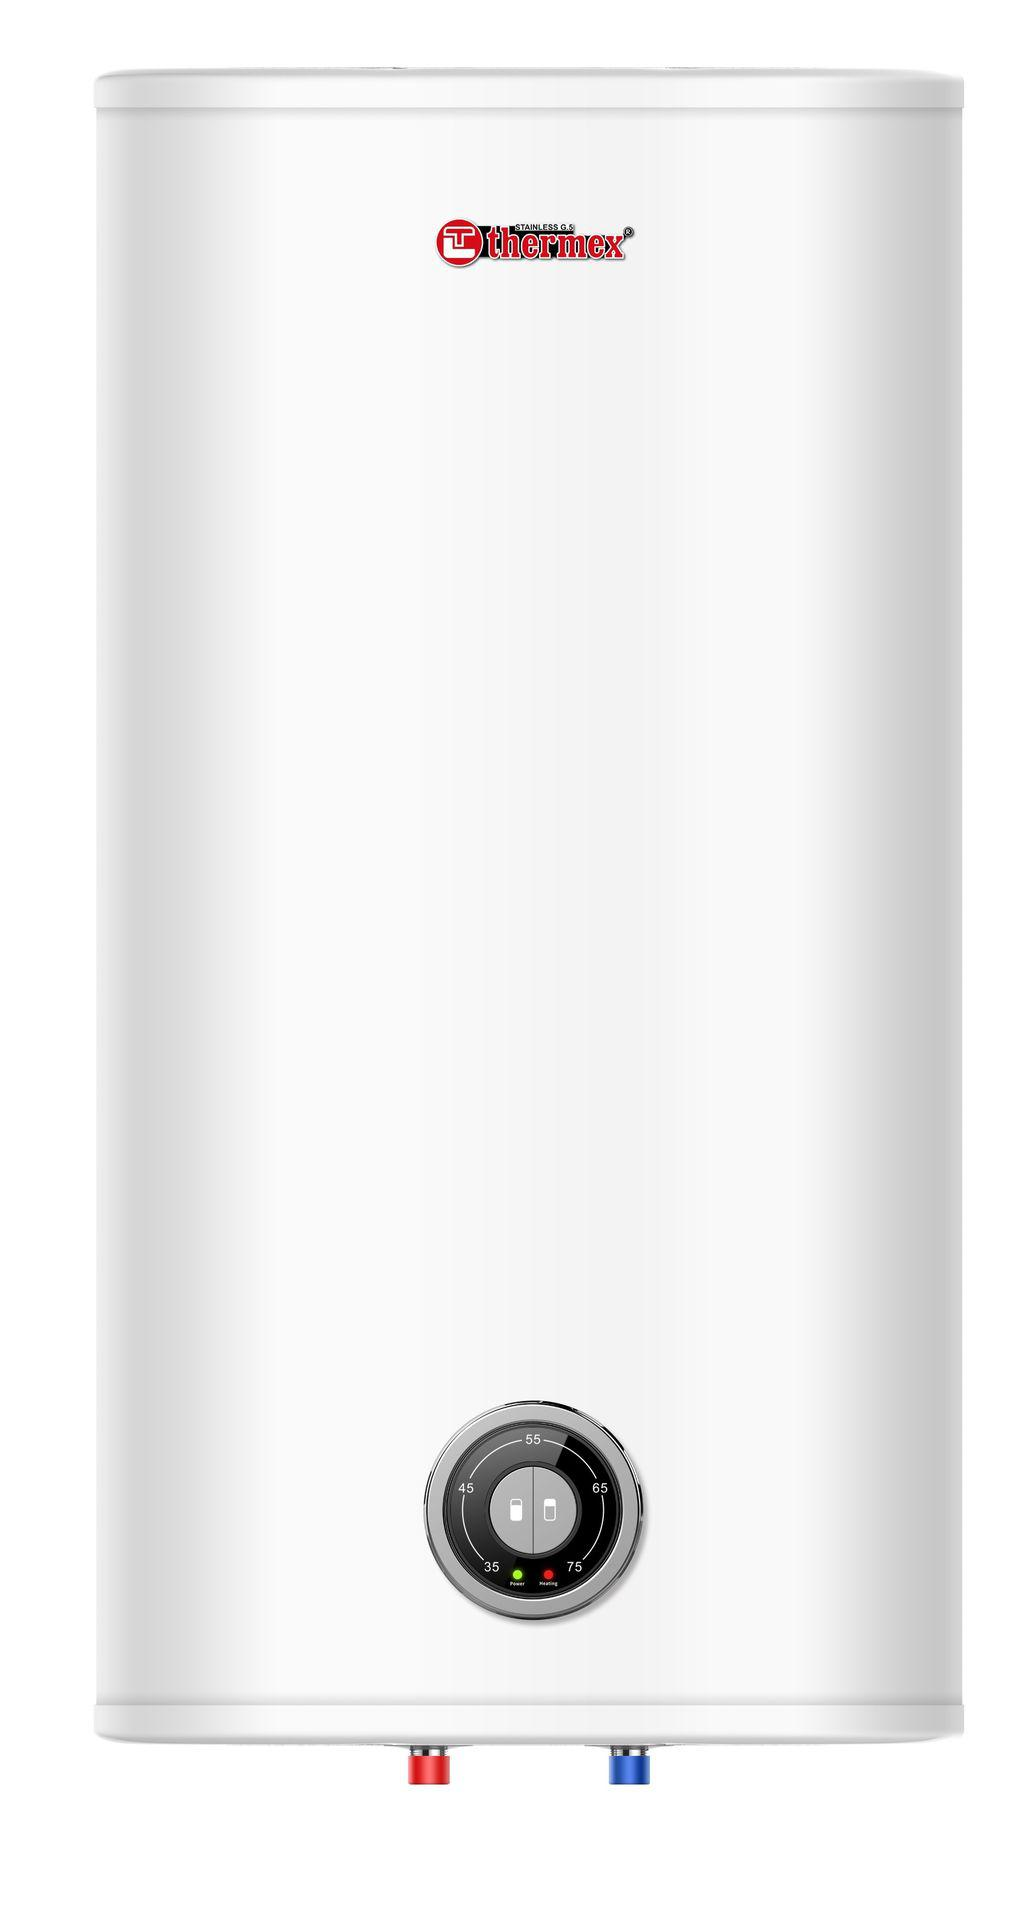 Водонагреватель Thermex Mk 100 v электрический накопительный водонагреватель thermex irp 200 f